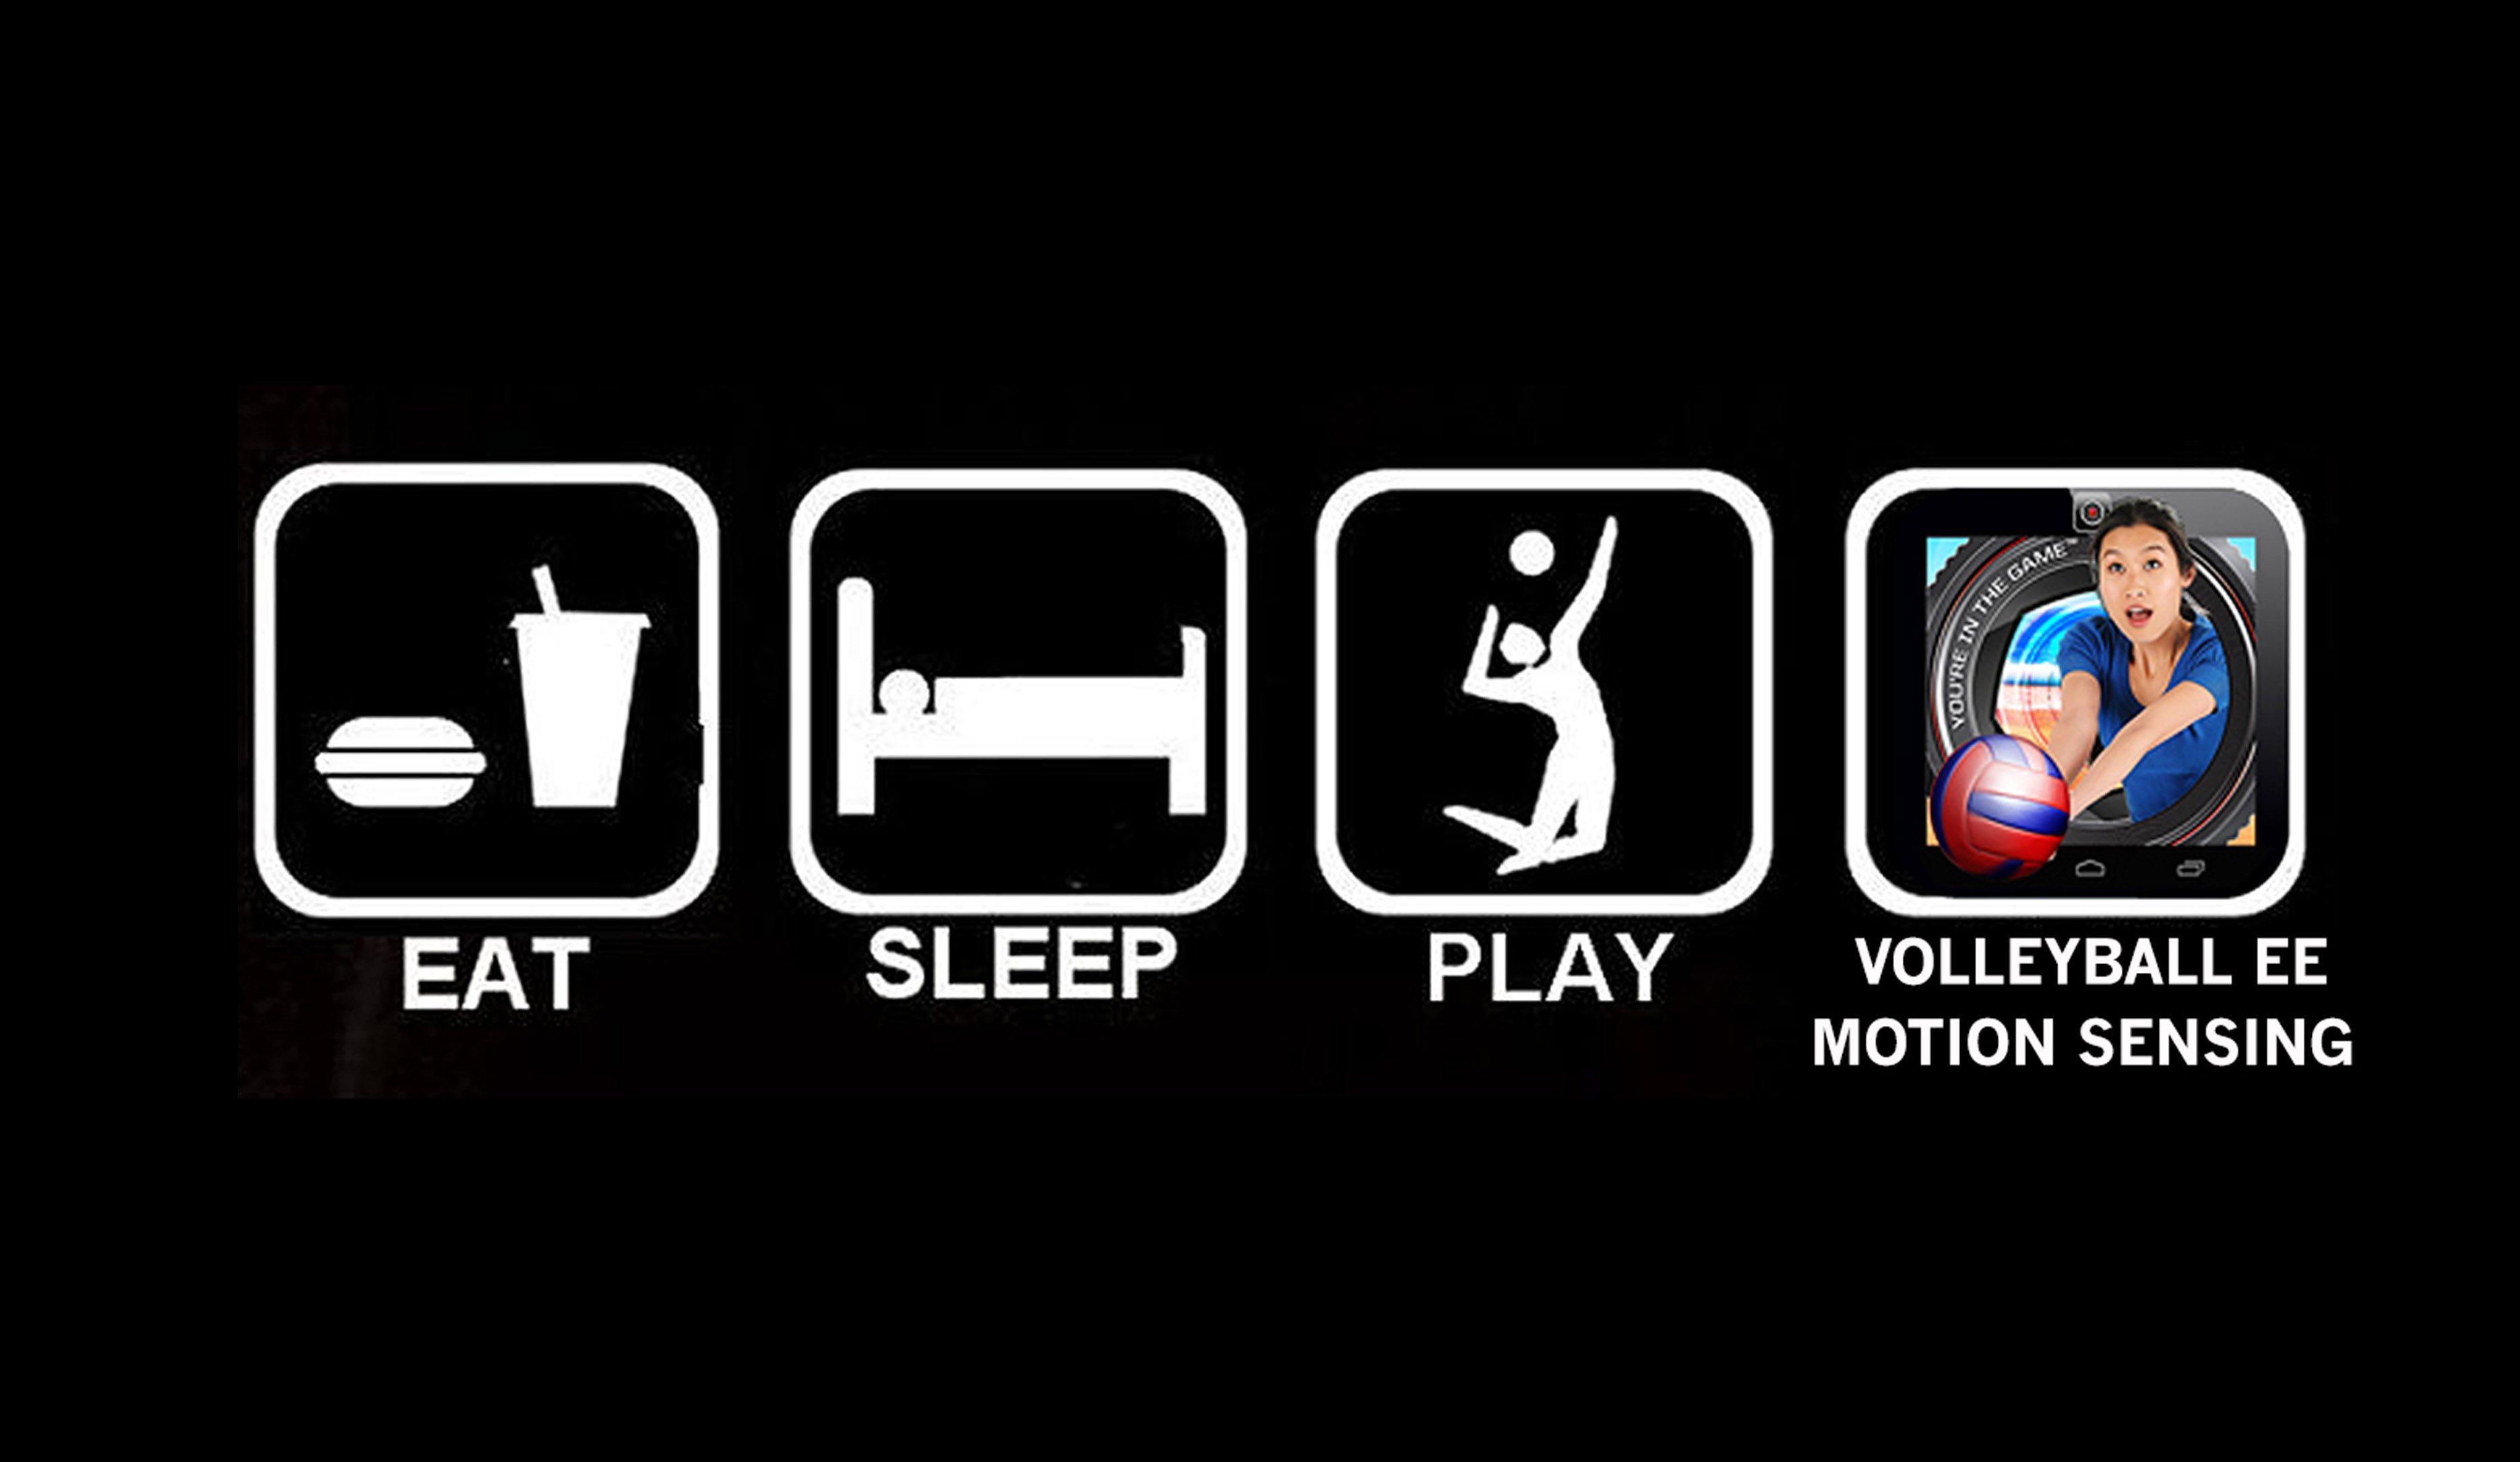 volleyball https://itunes.apple.com/us/app/volleyball-motion-sensing/id794303671?mt=8